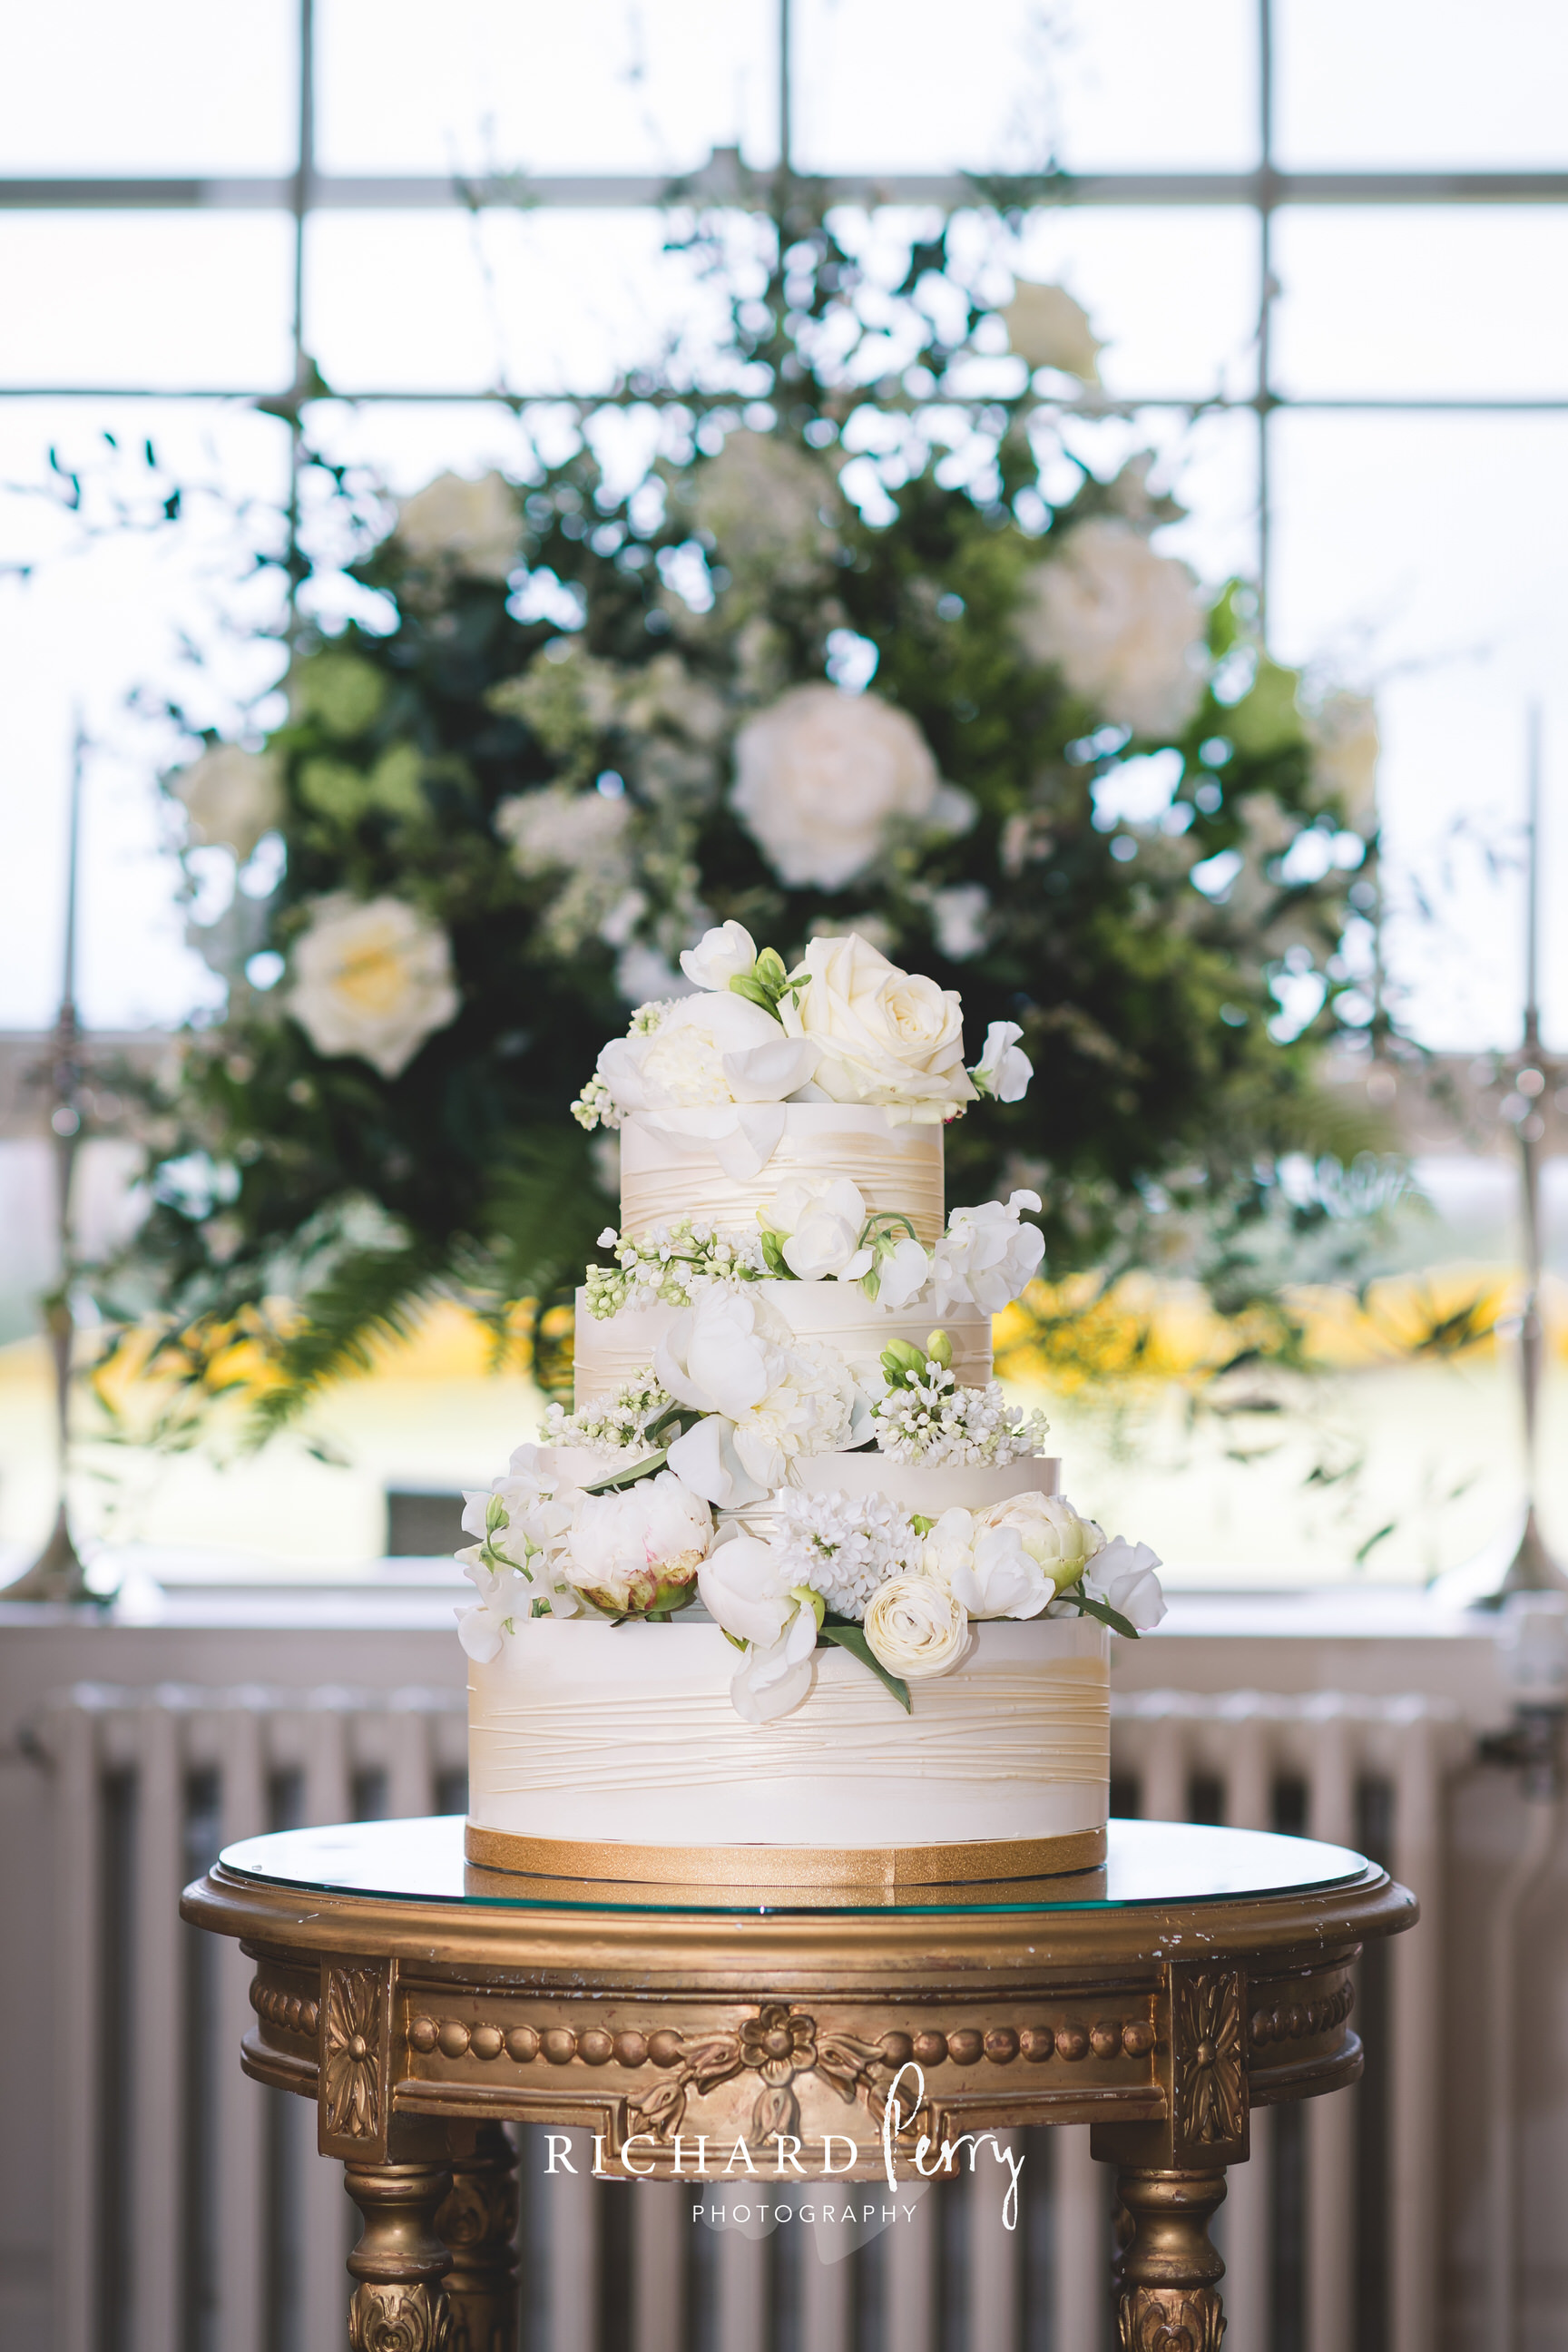 yorkshire-wedding-photographer-destination-archerfield-house-9.jpg